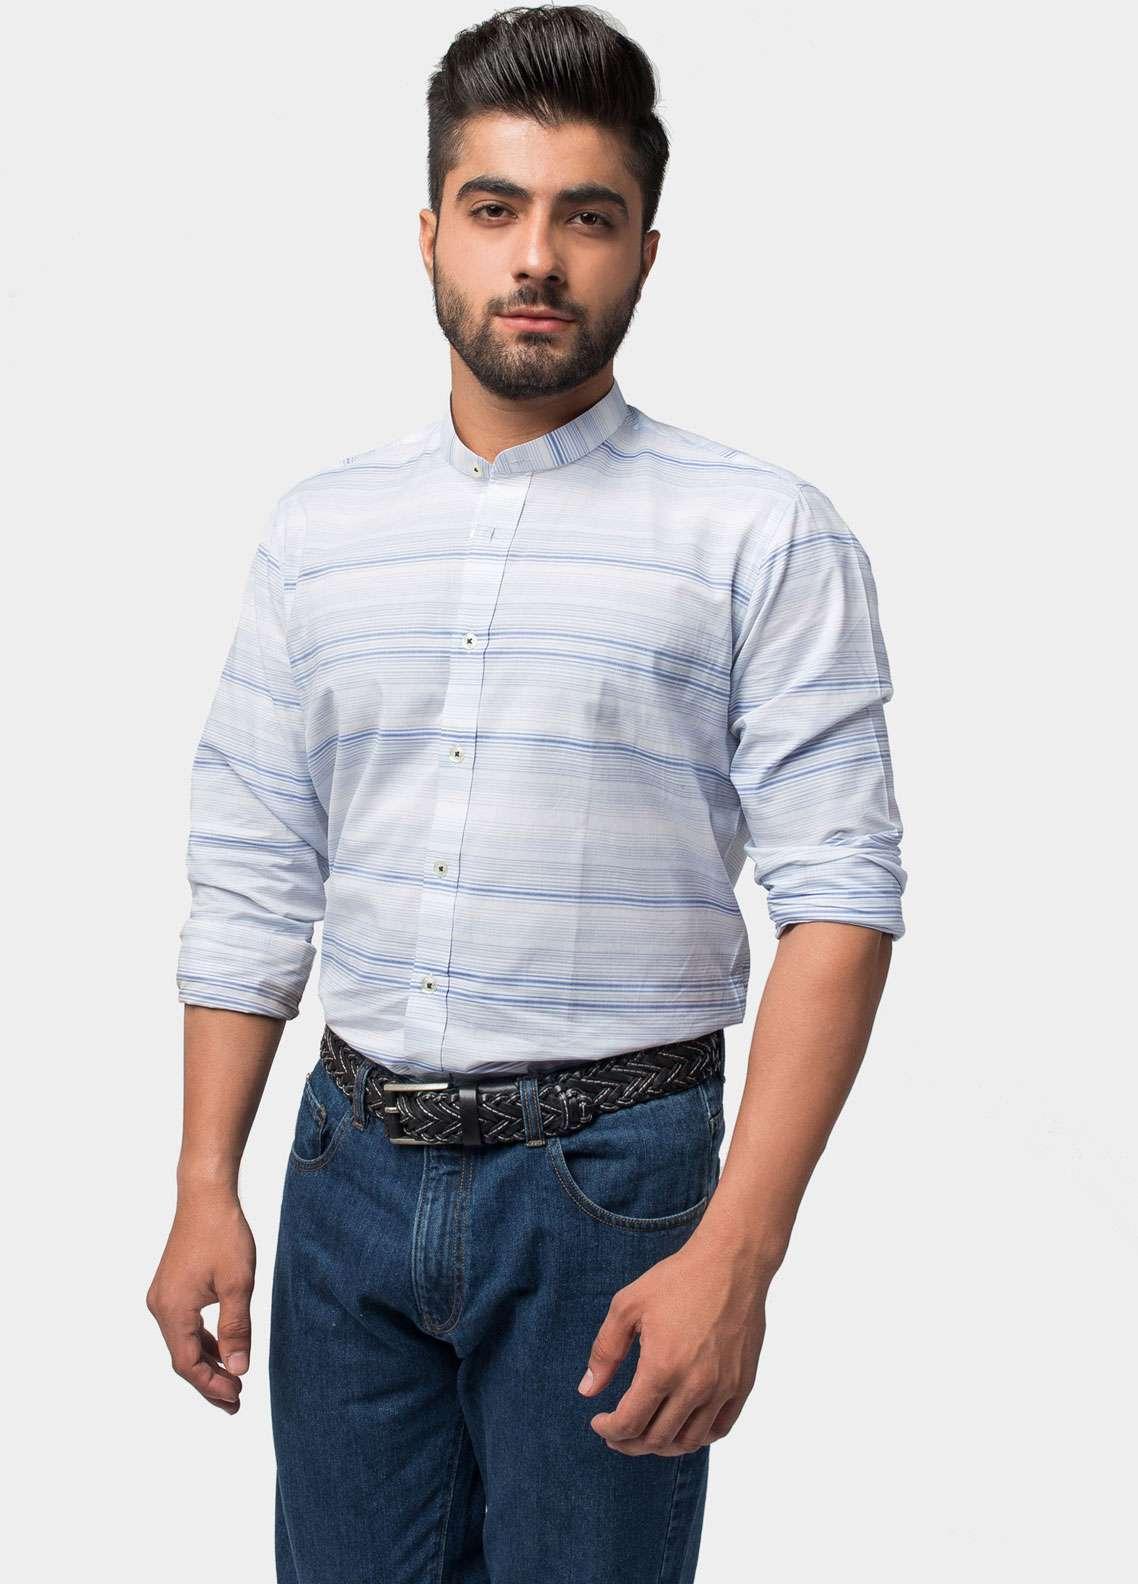 Brumano Cotton Formal Men Shirts - Blue BRM-539